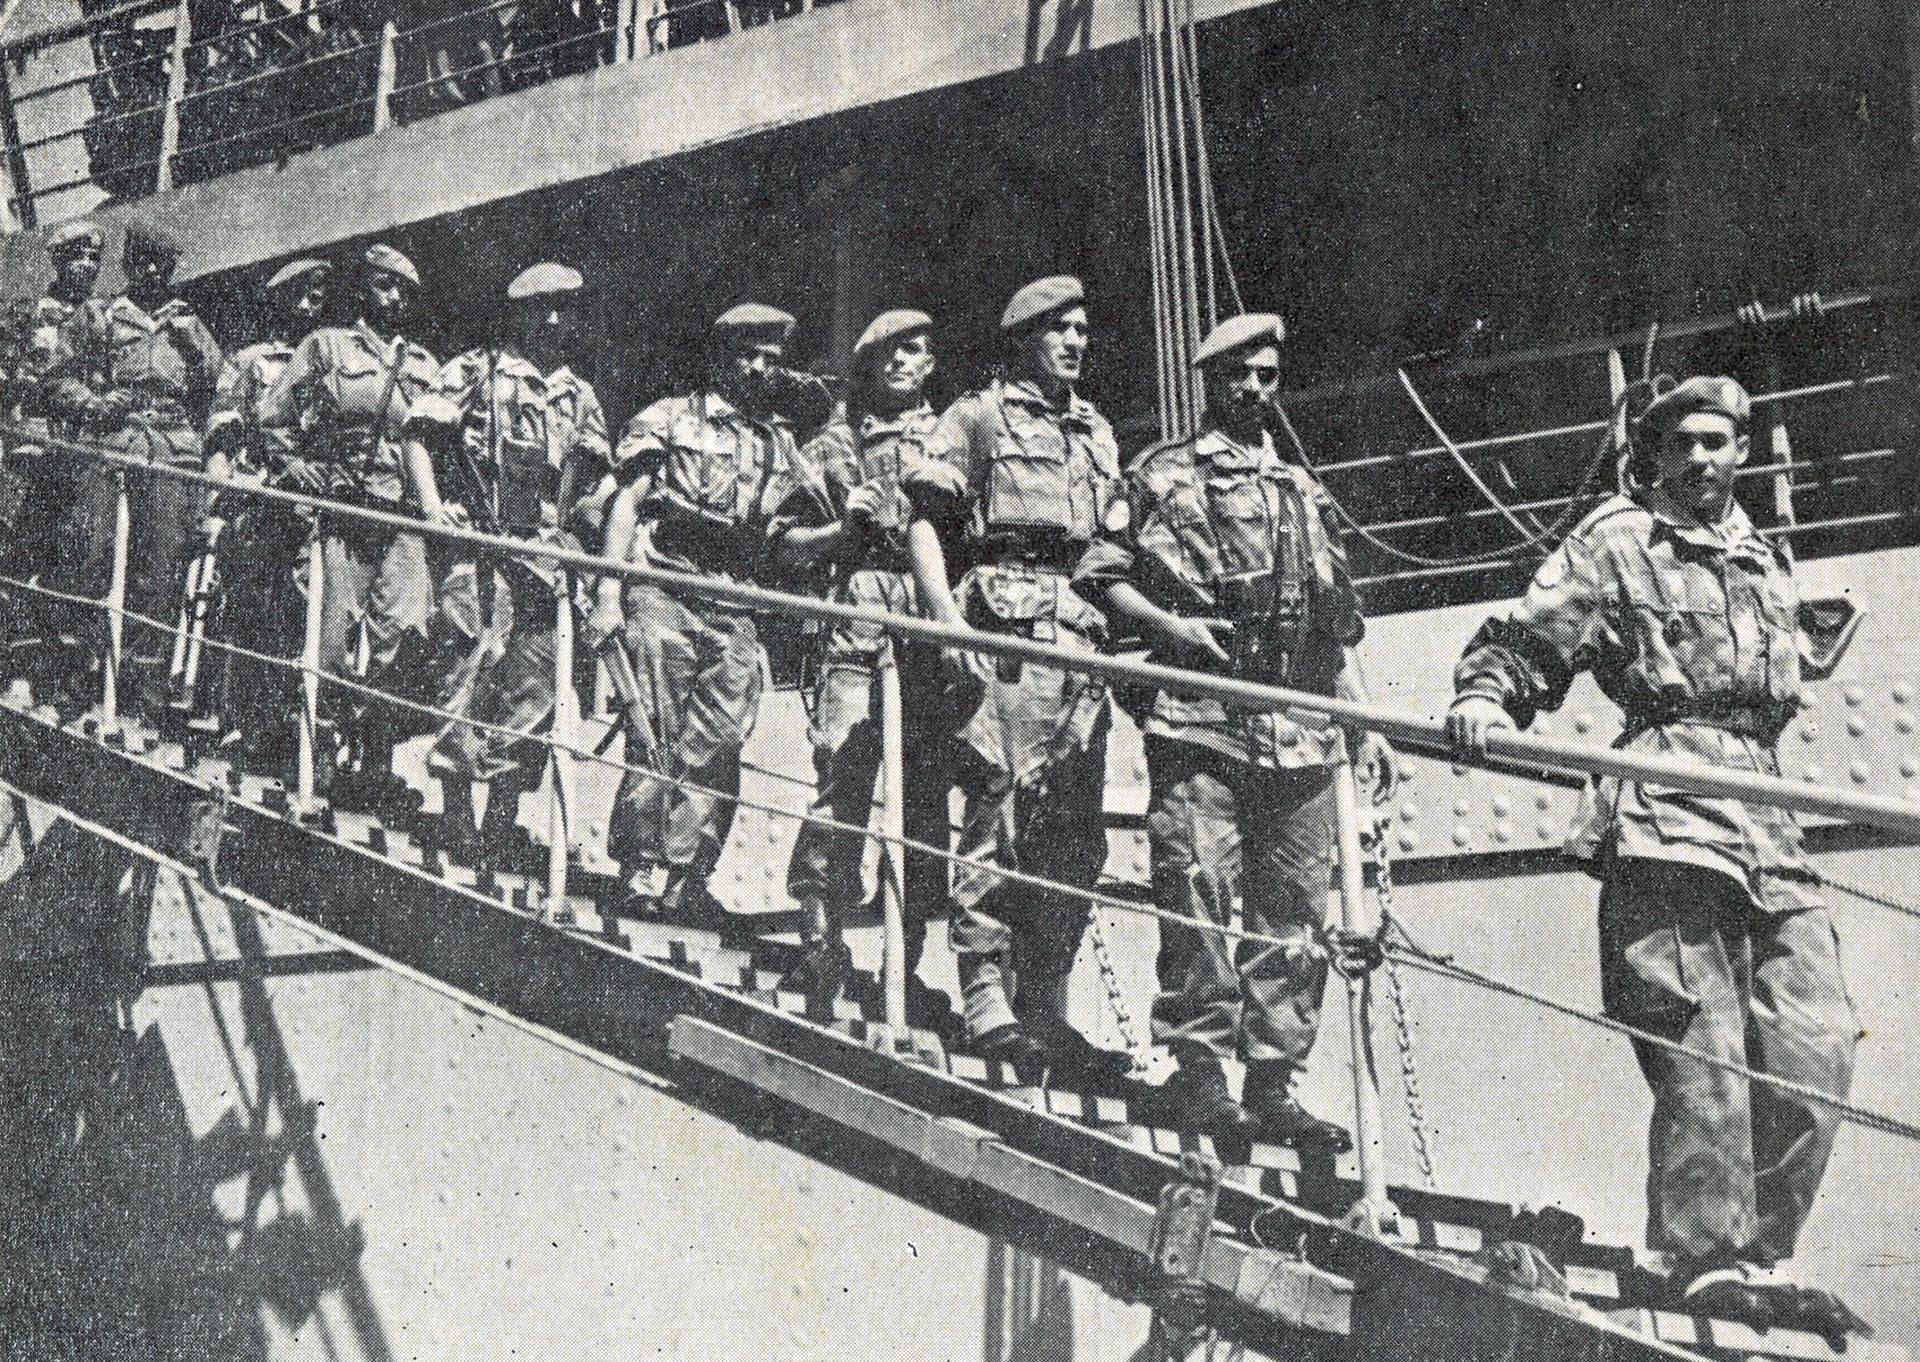 Les Forces Armées Royales au Congo - ONUC - 1960/61 31535619233_6b5e3ed6e8_o